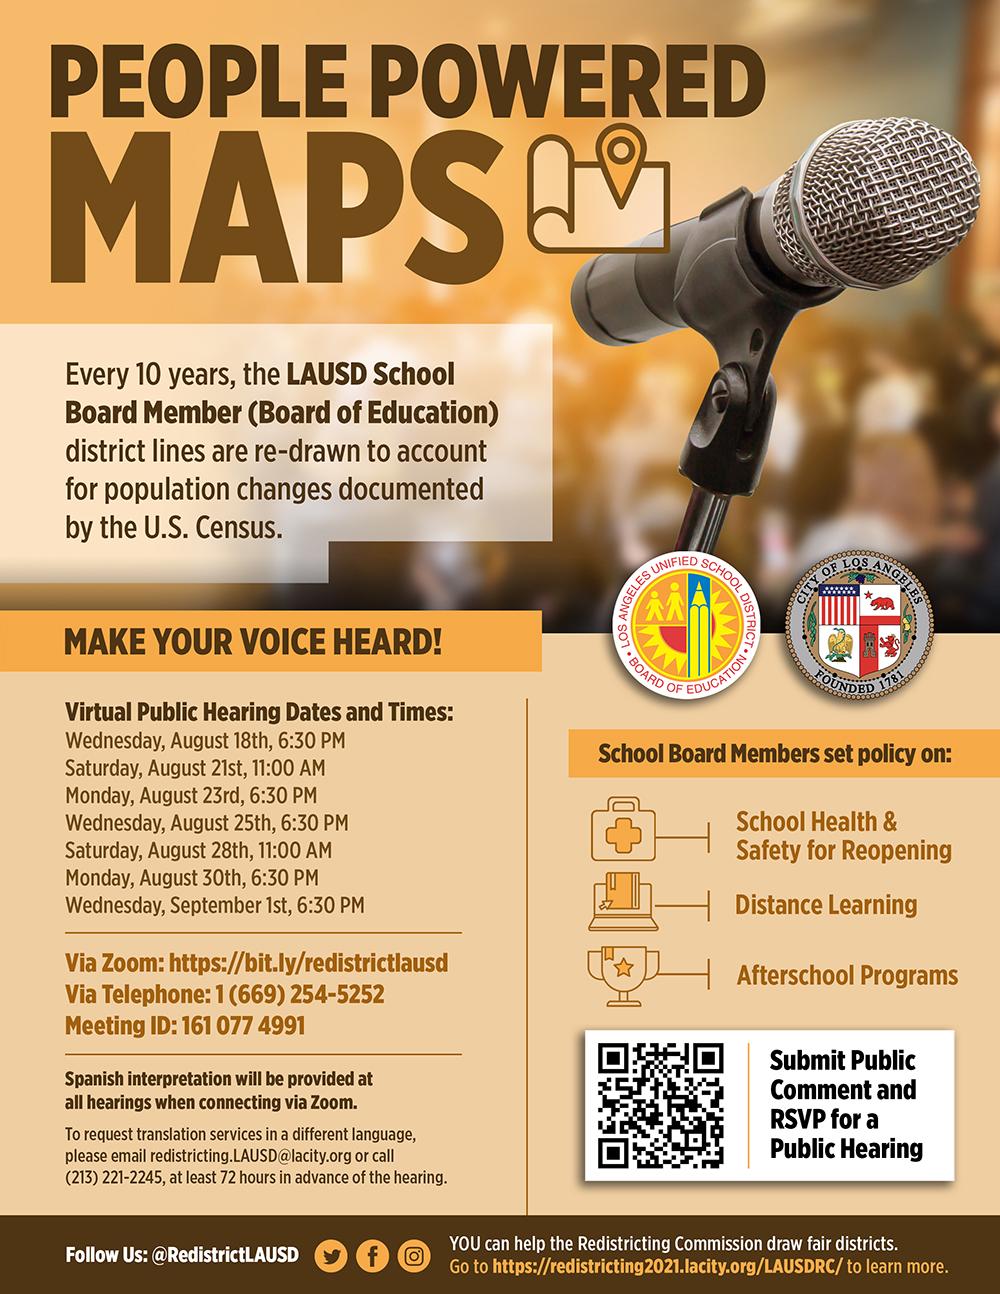 LAUSD Redistricting Public Hearing